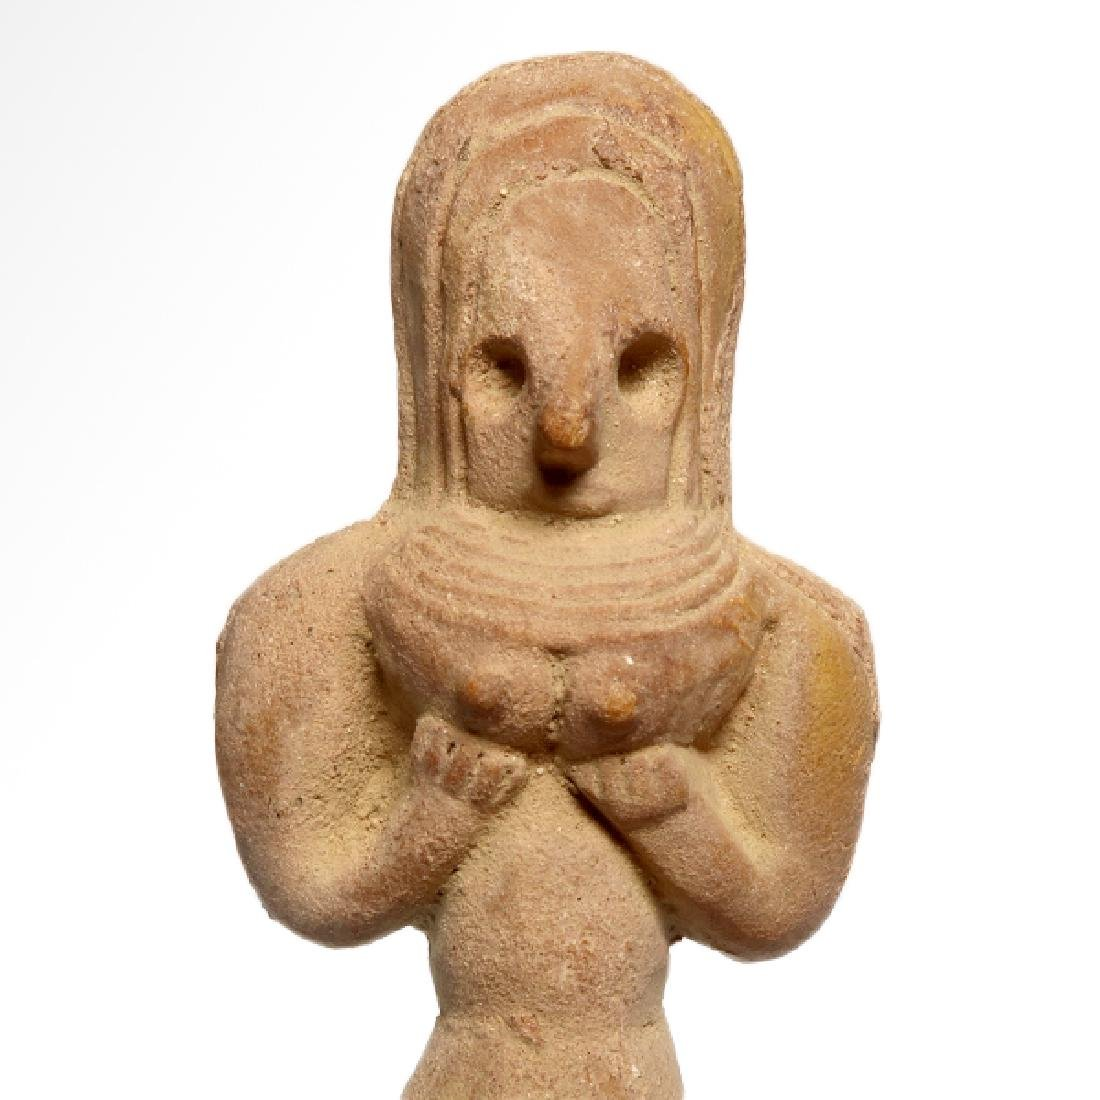 Indus-Valley Mother Goddess, Harappan, c. 2400 B.C. - 2